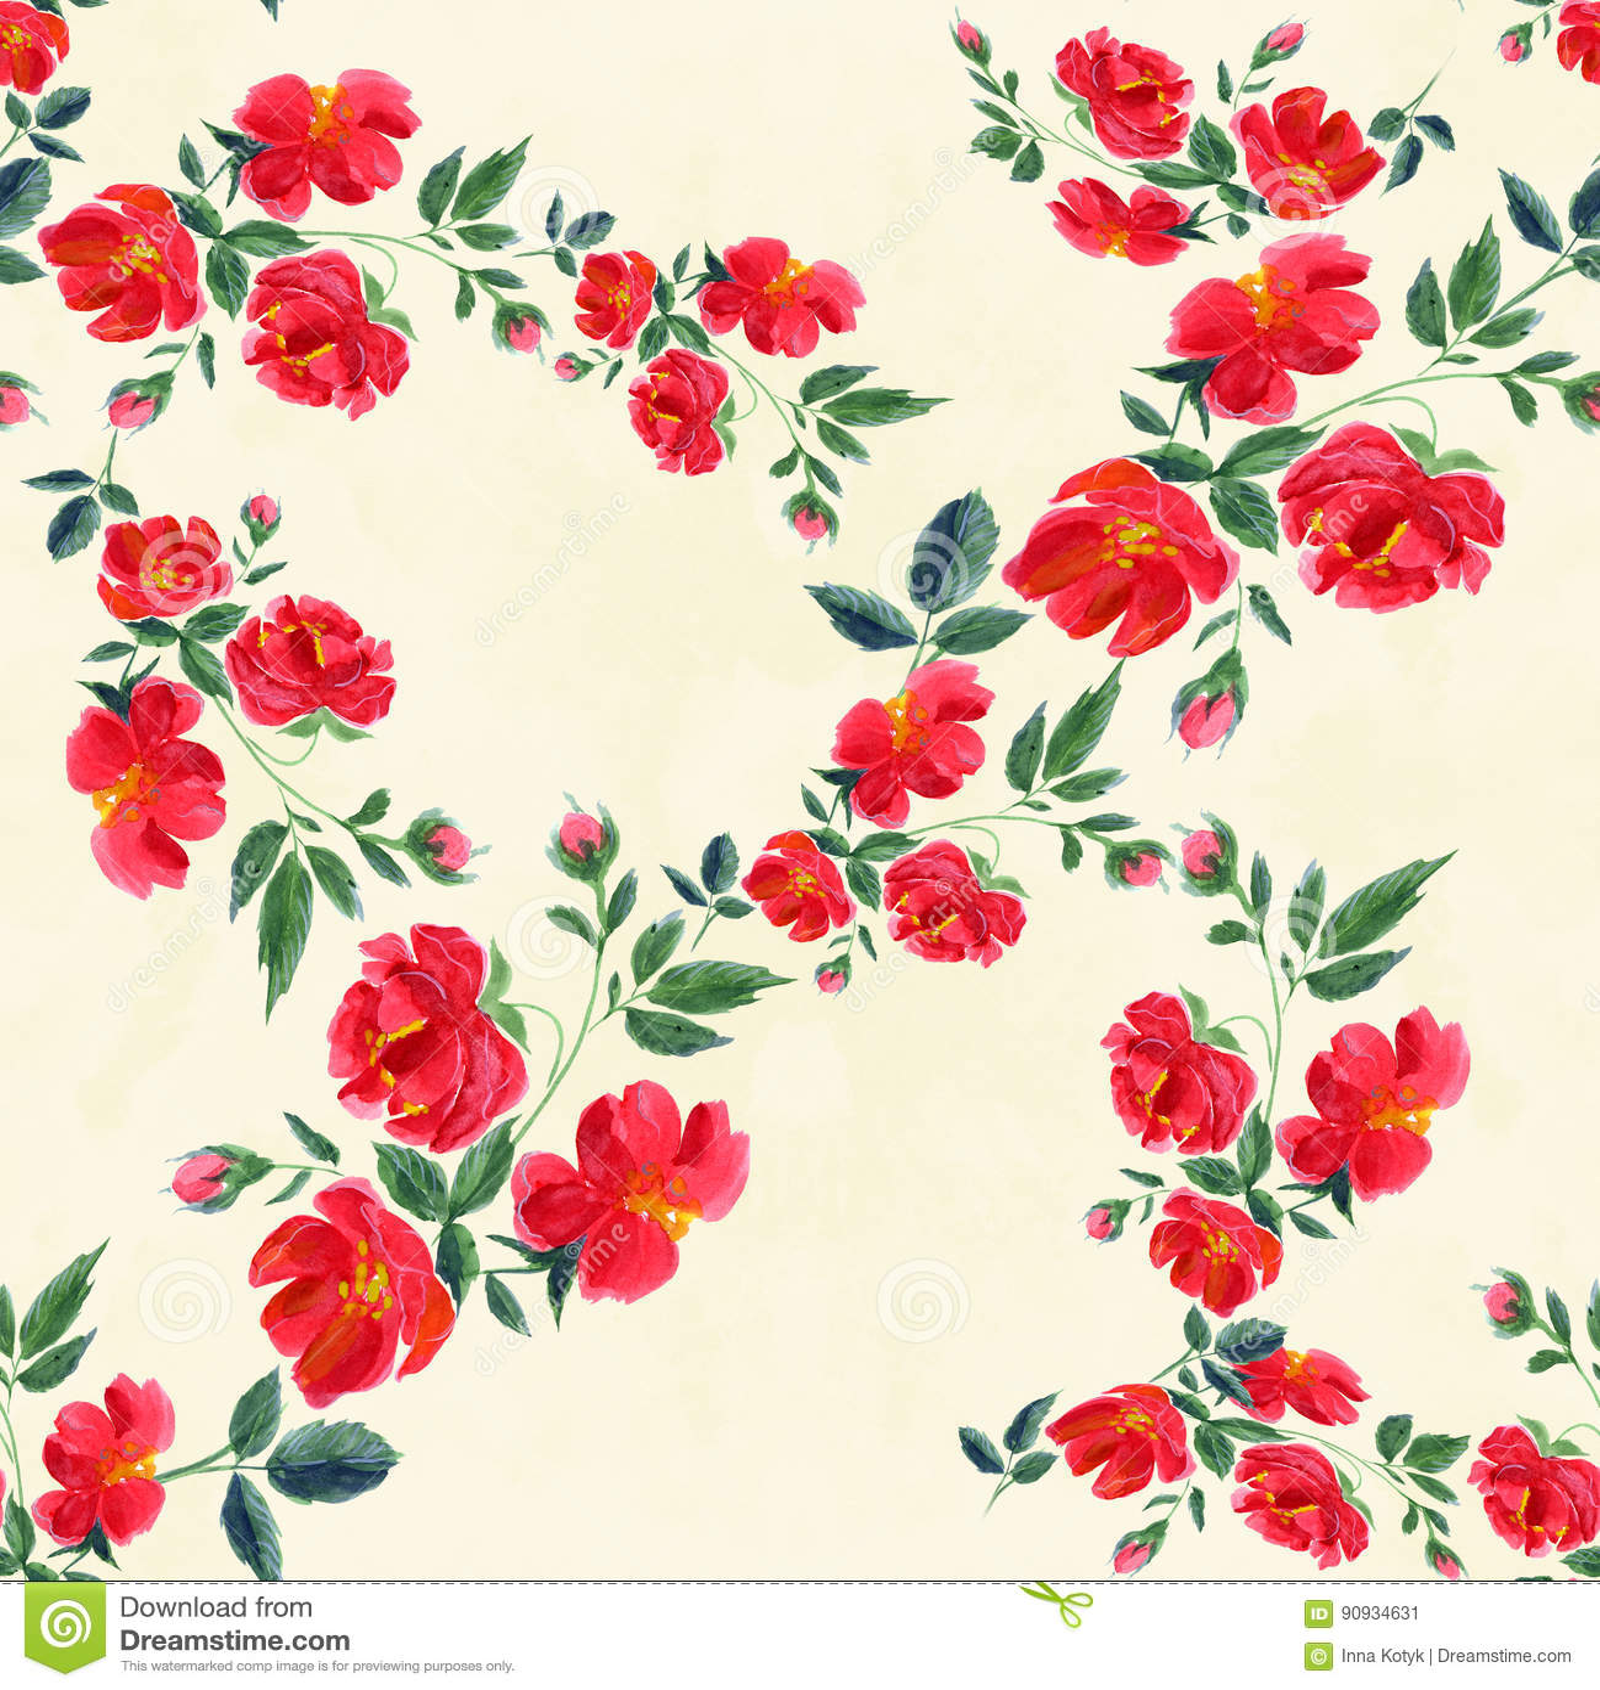 Flores Papel Pintado Abstracto Con Adornos Florales Golpeteo - Adornos-florales